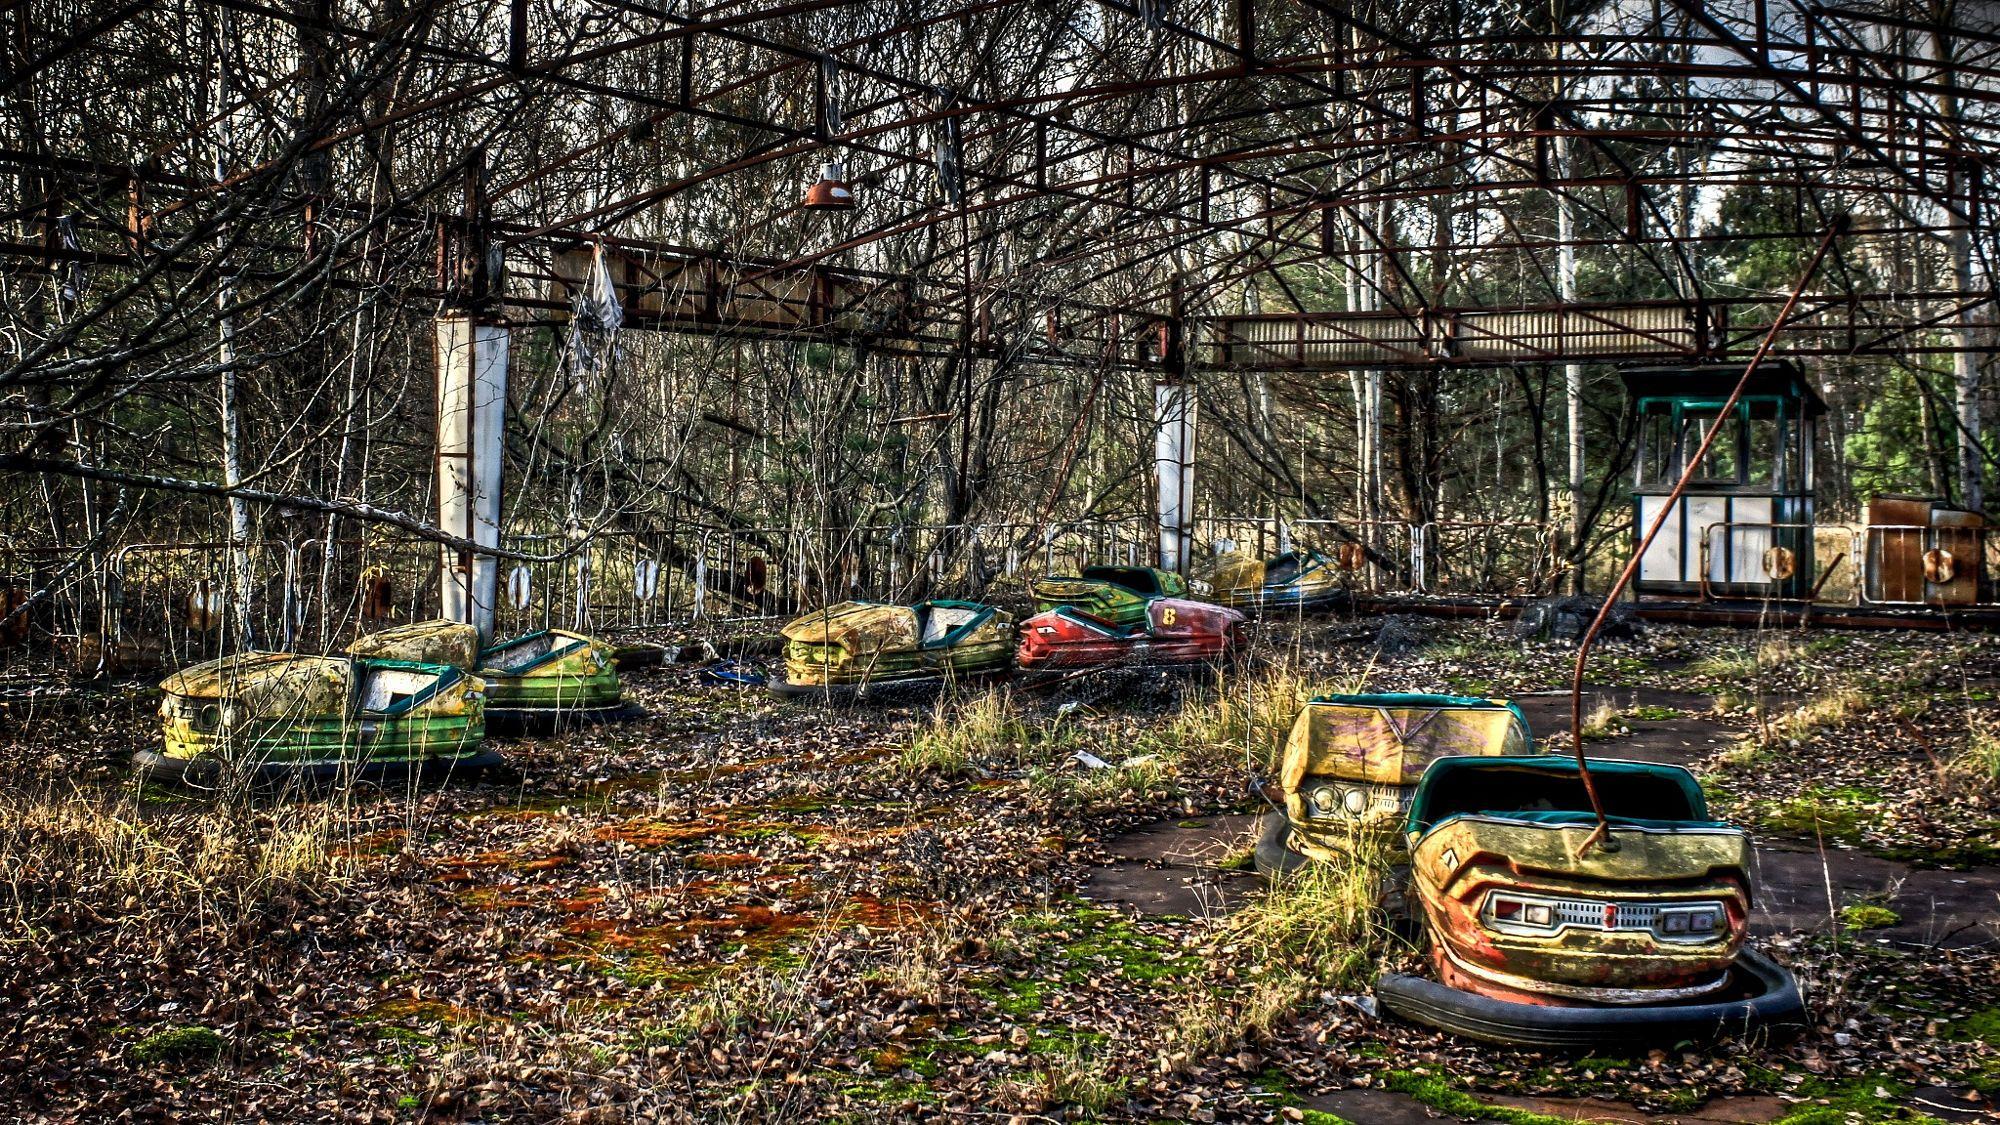 Pripyat: Bumper Cars by Barry Mangham on 500px